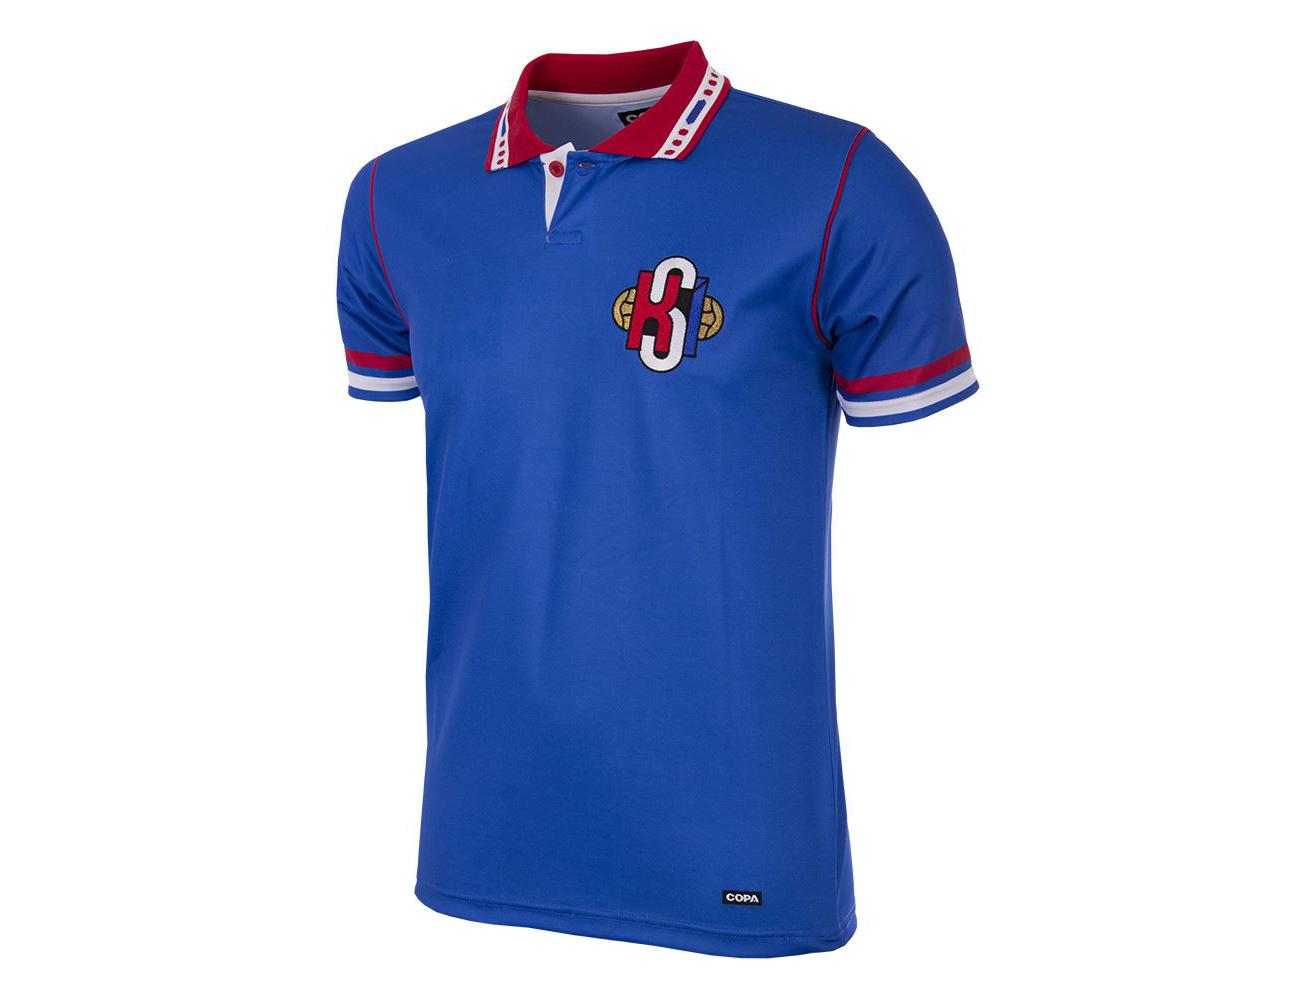 Iceland-1996-Short-Sleeve-Retro-Football-Shirt-blue-4132